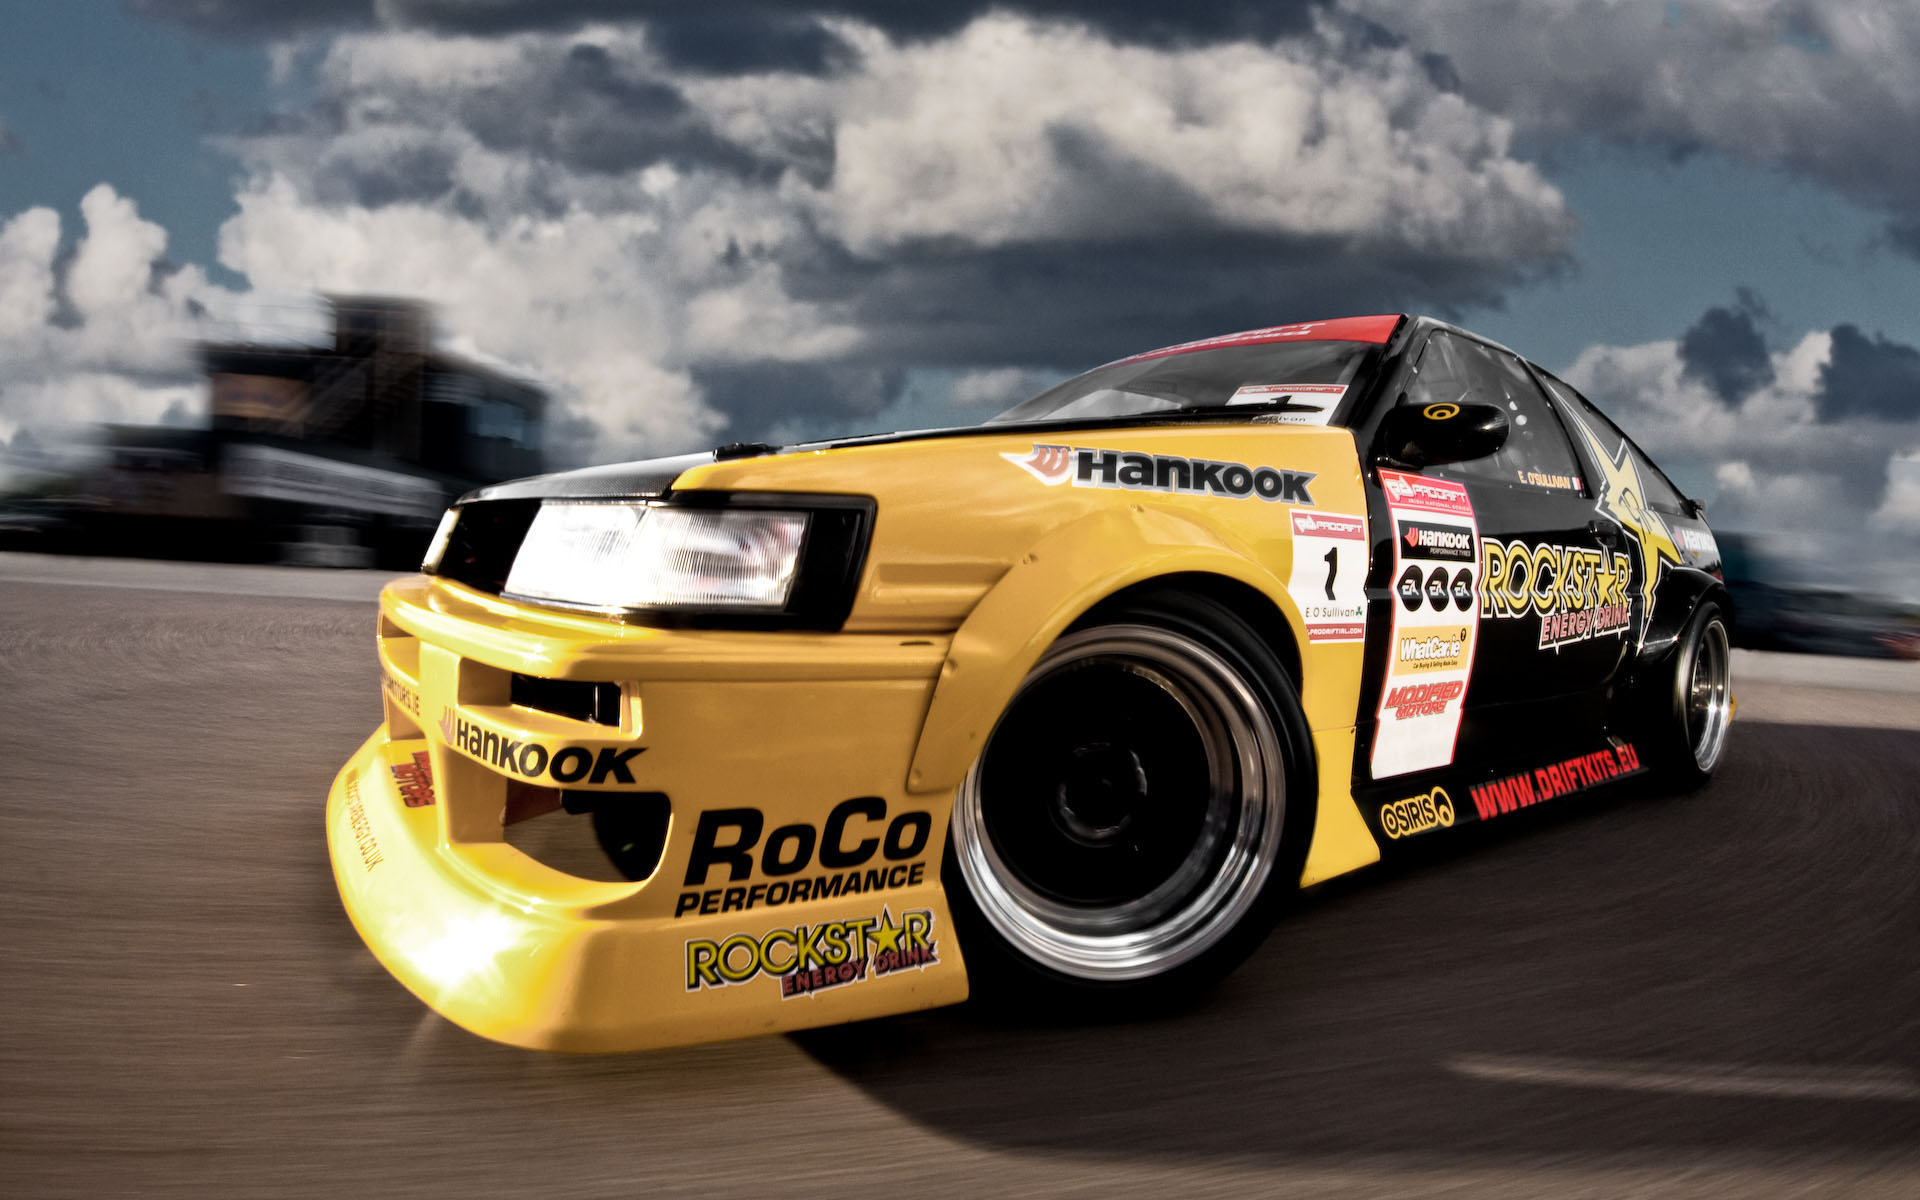 Rockstar AE86 tuning - 1920x1200